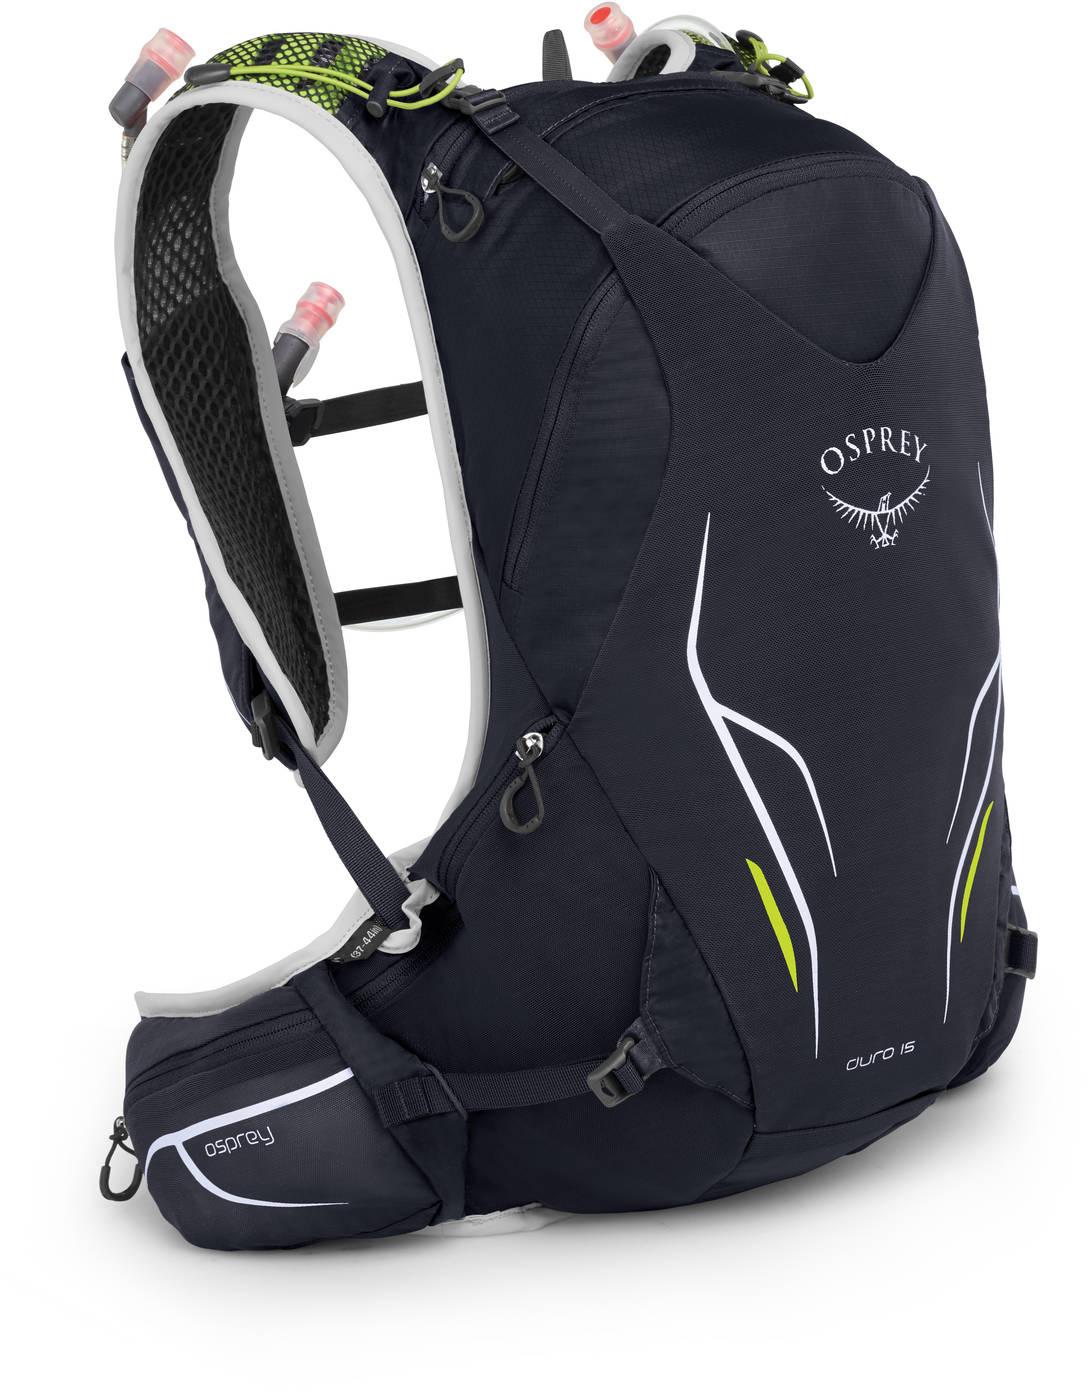 Рюкзаки для бега Рюкзак беговой Osprey Duro 15 Alpine Black Duro_15_S19_Side_Alpine_Black_web.jpg